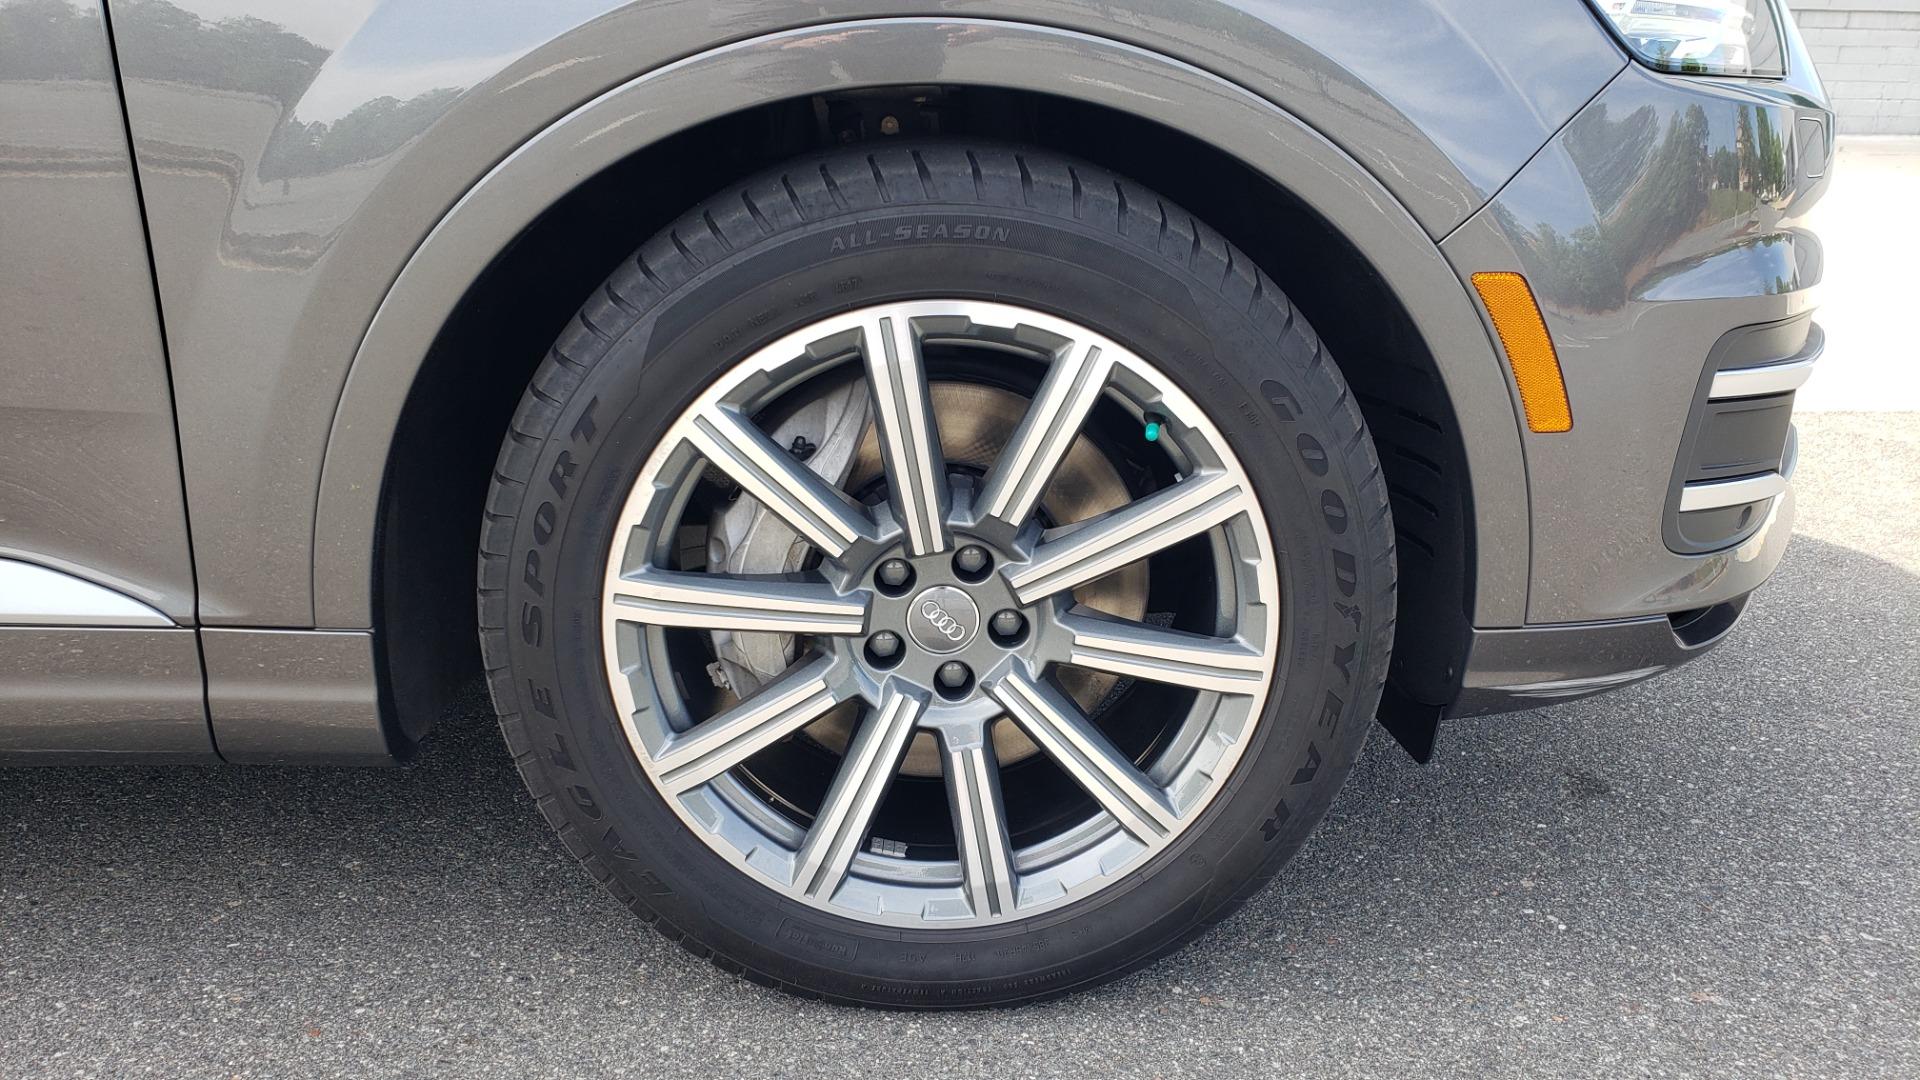 Used 2018 Audi Q7 PRESTIGE TIPTRONIC / NAV / SUNROOF / ADAPTIVE PKG / DRVR ASST / CLD WTHR /  for sale $49,995 at Formula Imports in Charlotte NC 28227 93